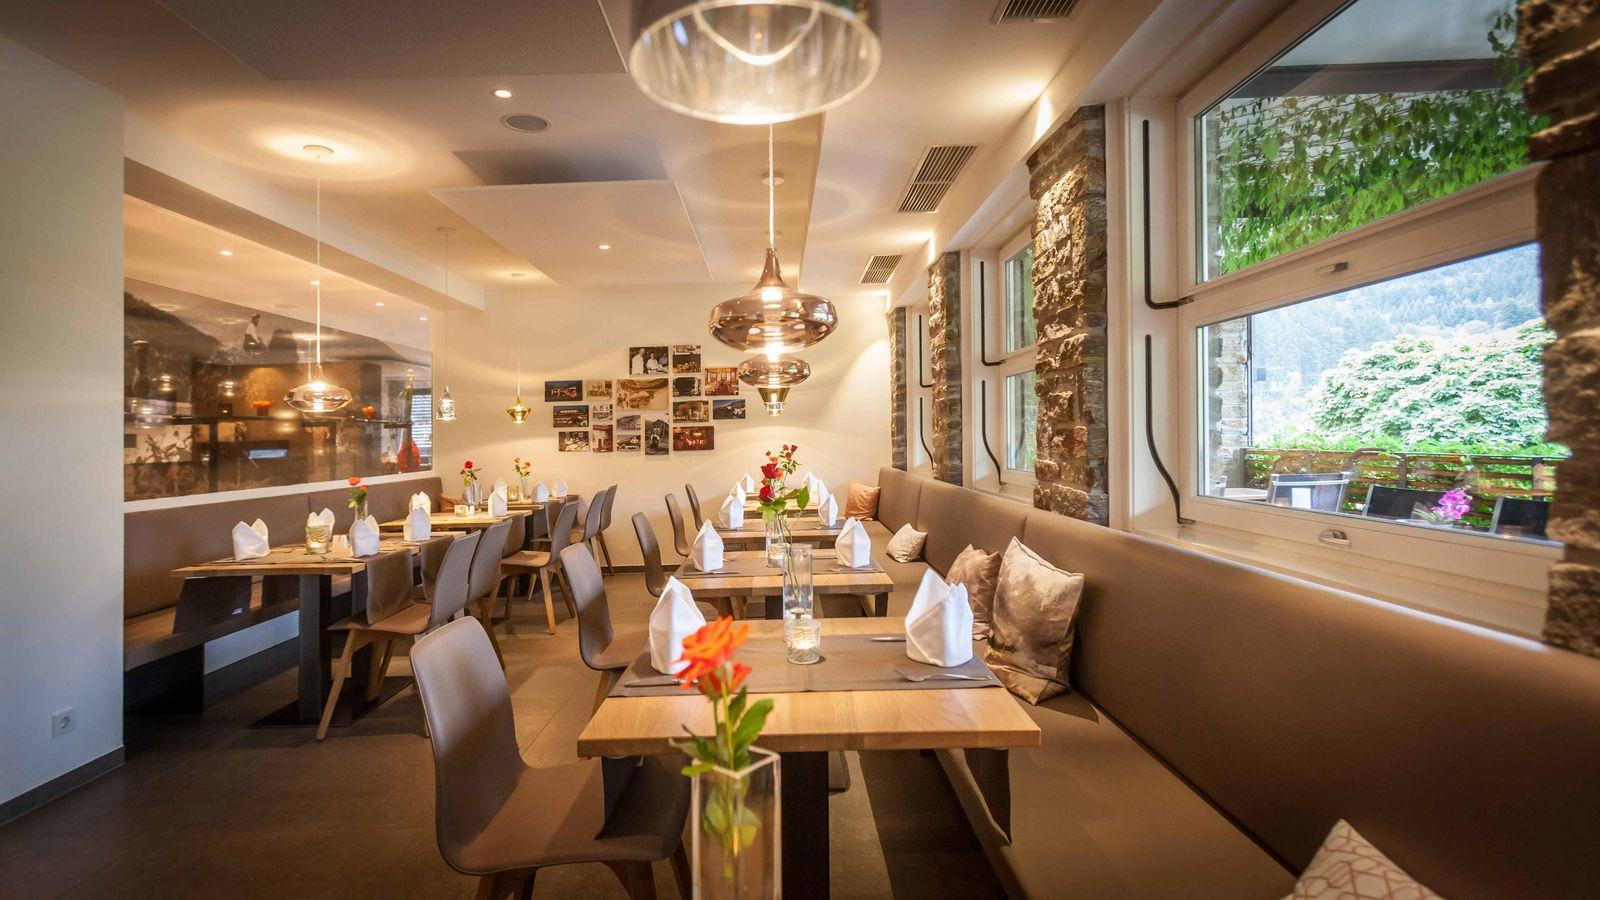 kirnbacher hof modernes design hotel mit wellness im schwarzwald reiseziele pinterest. Black Bedroom Furniture Sets. Home Design Ideas